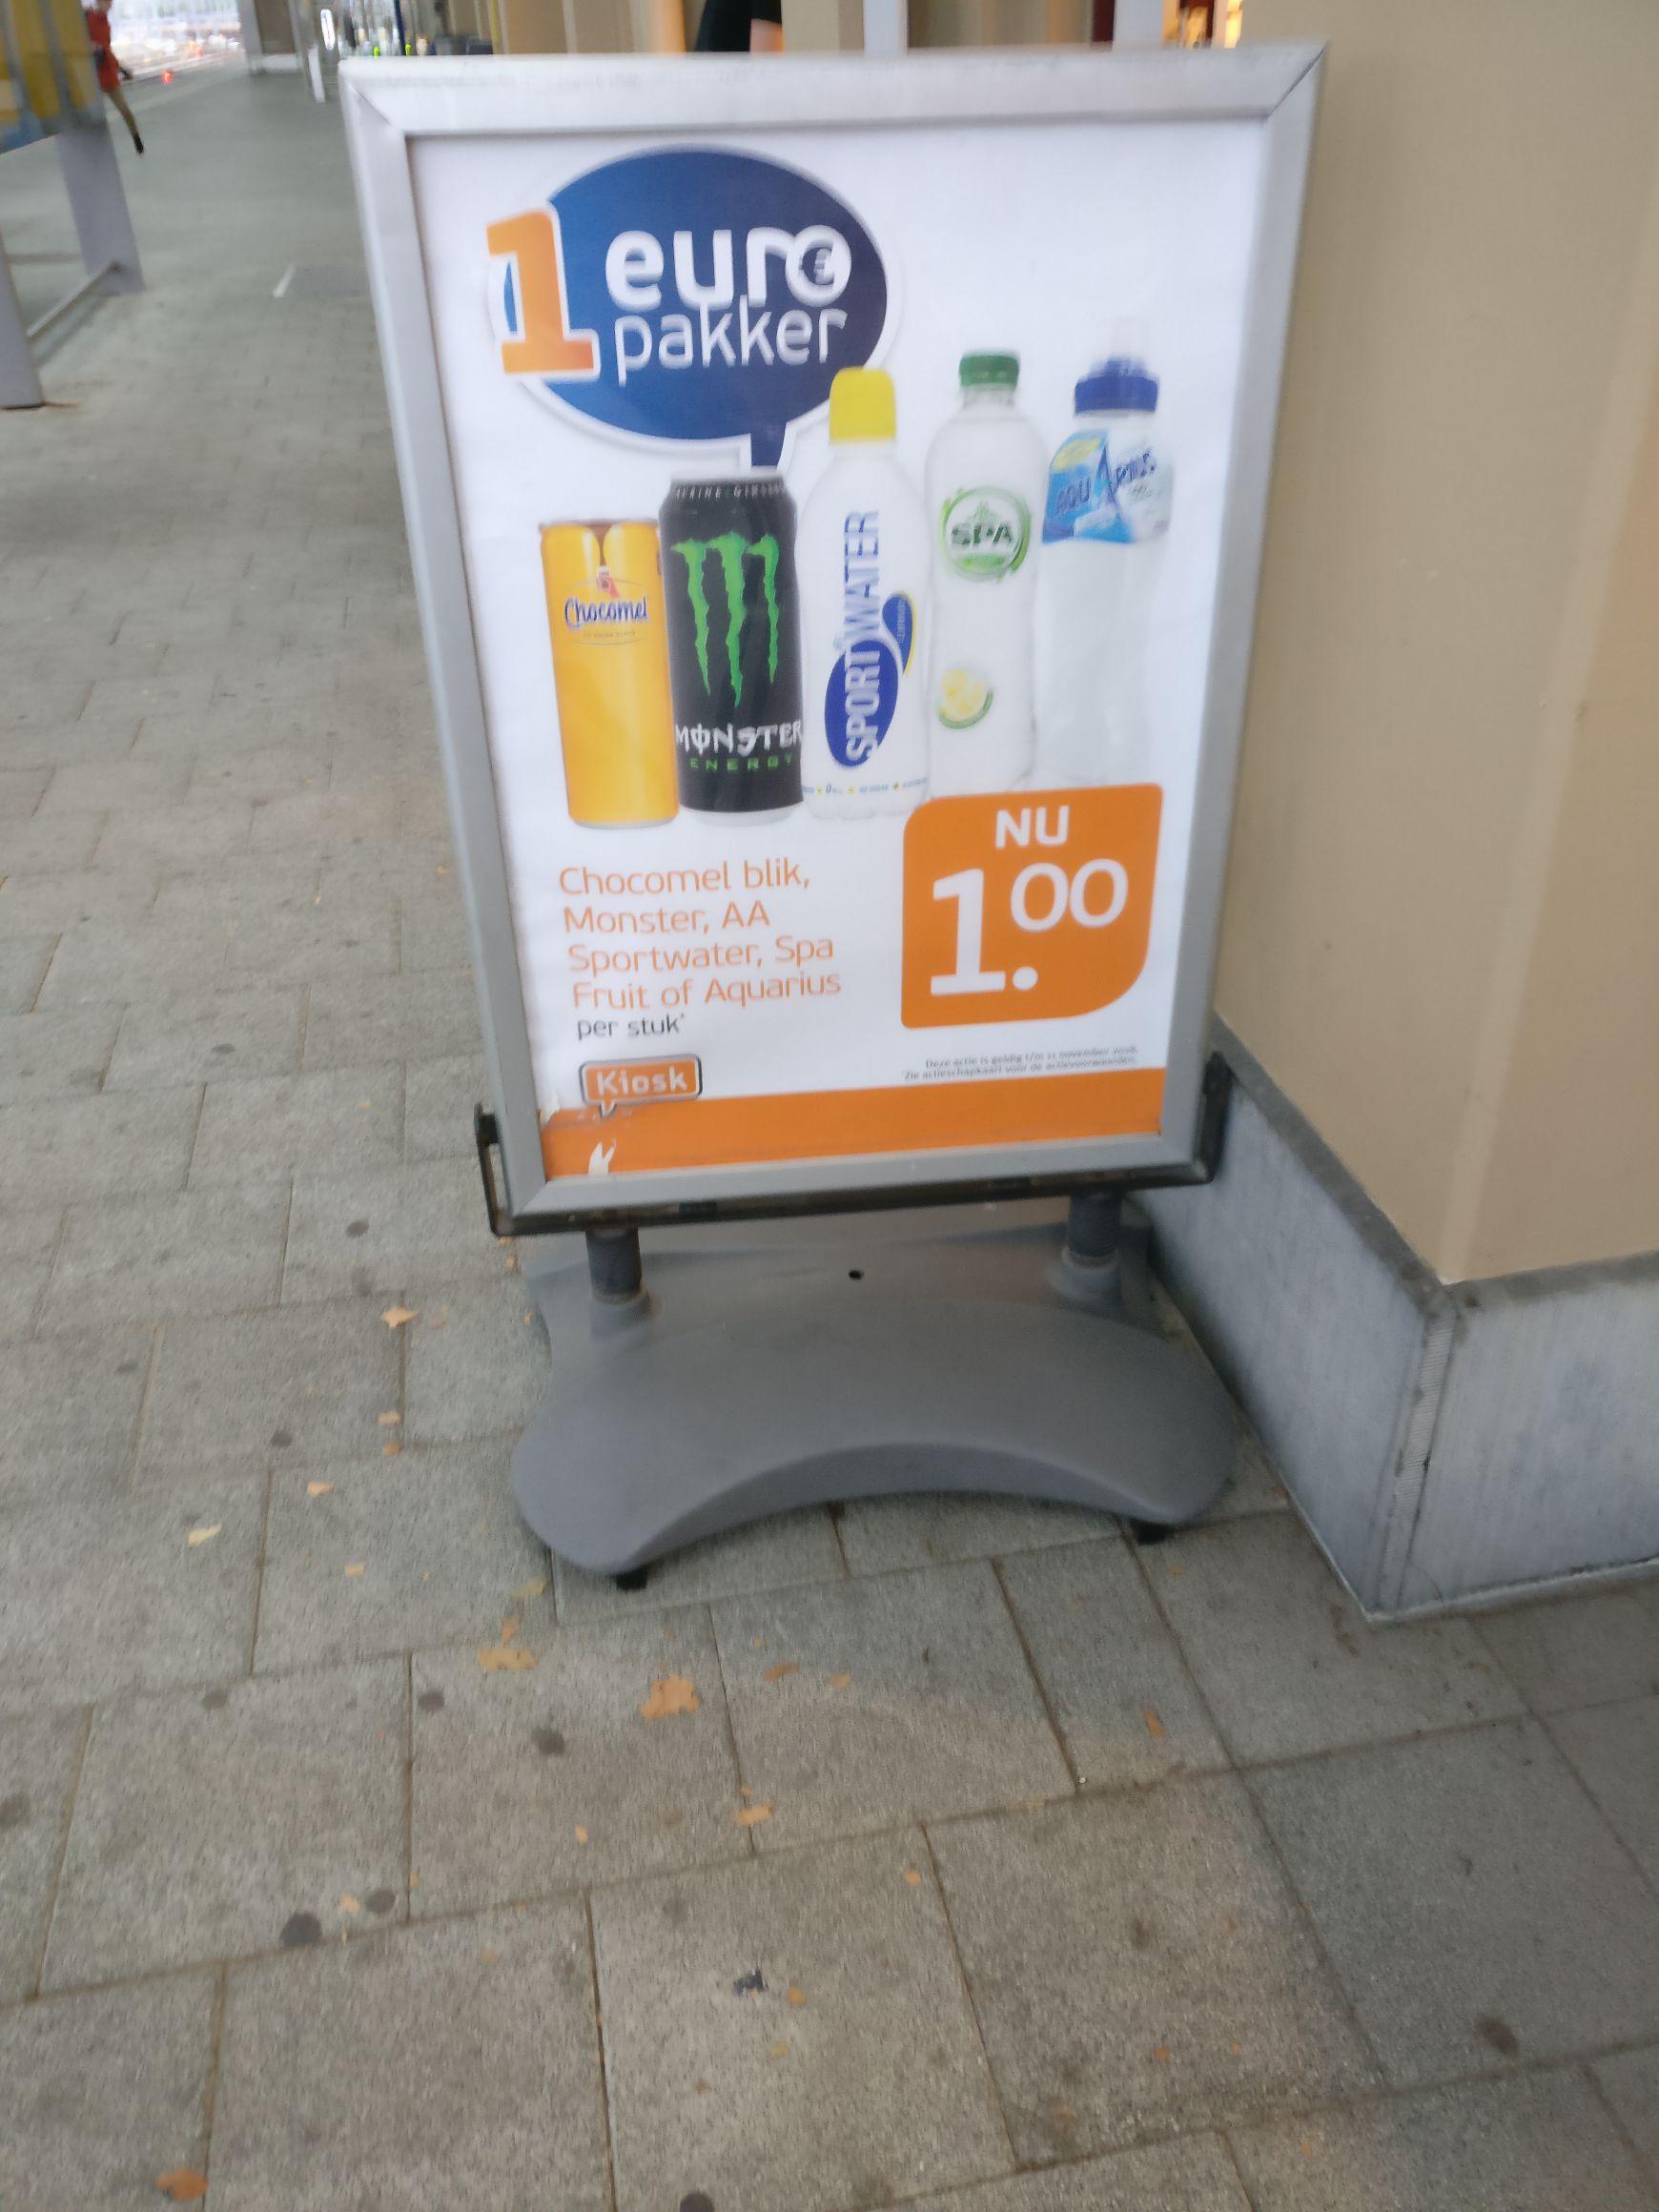 KIOSK meerdere grote stations gekoeld. o.a 0.5L Monster energy €1.00